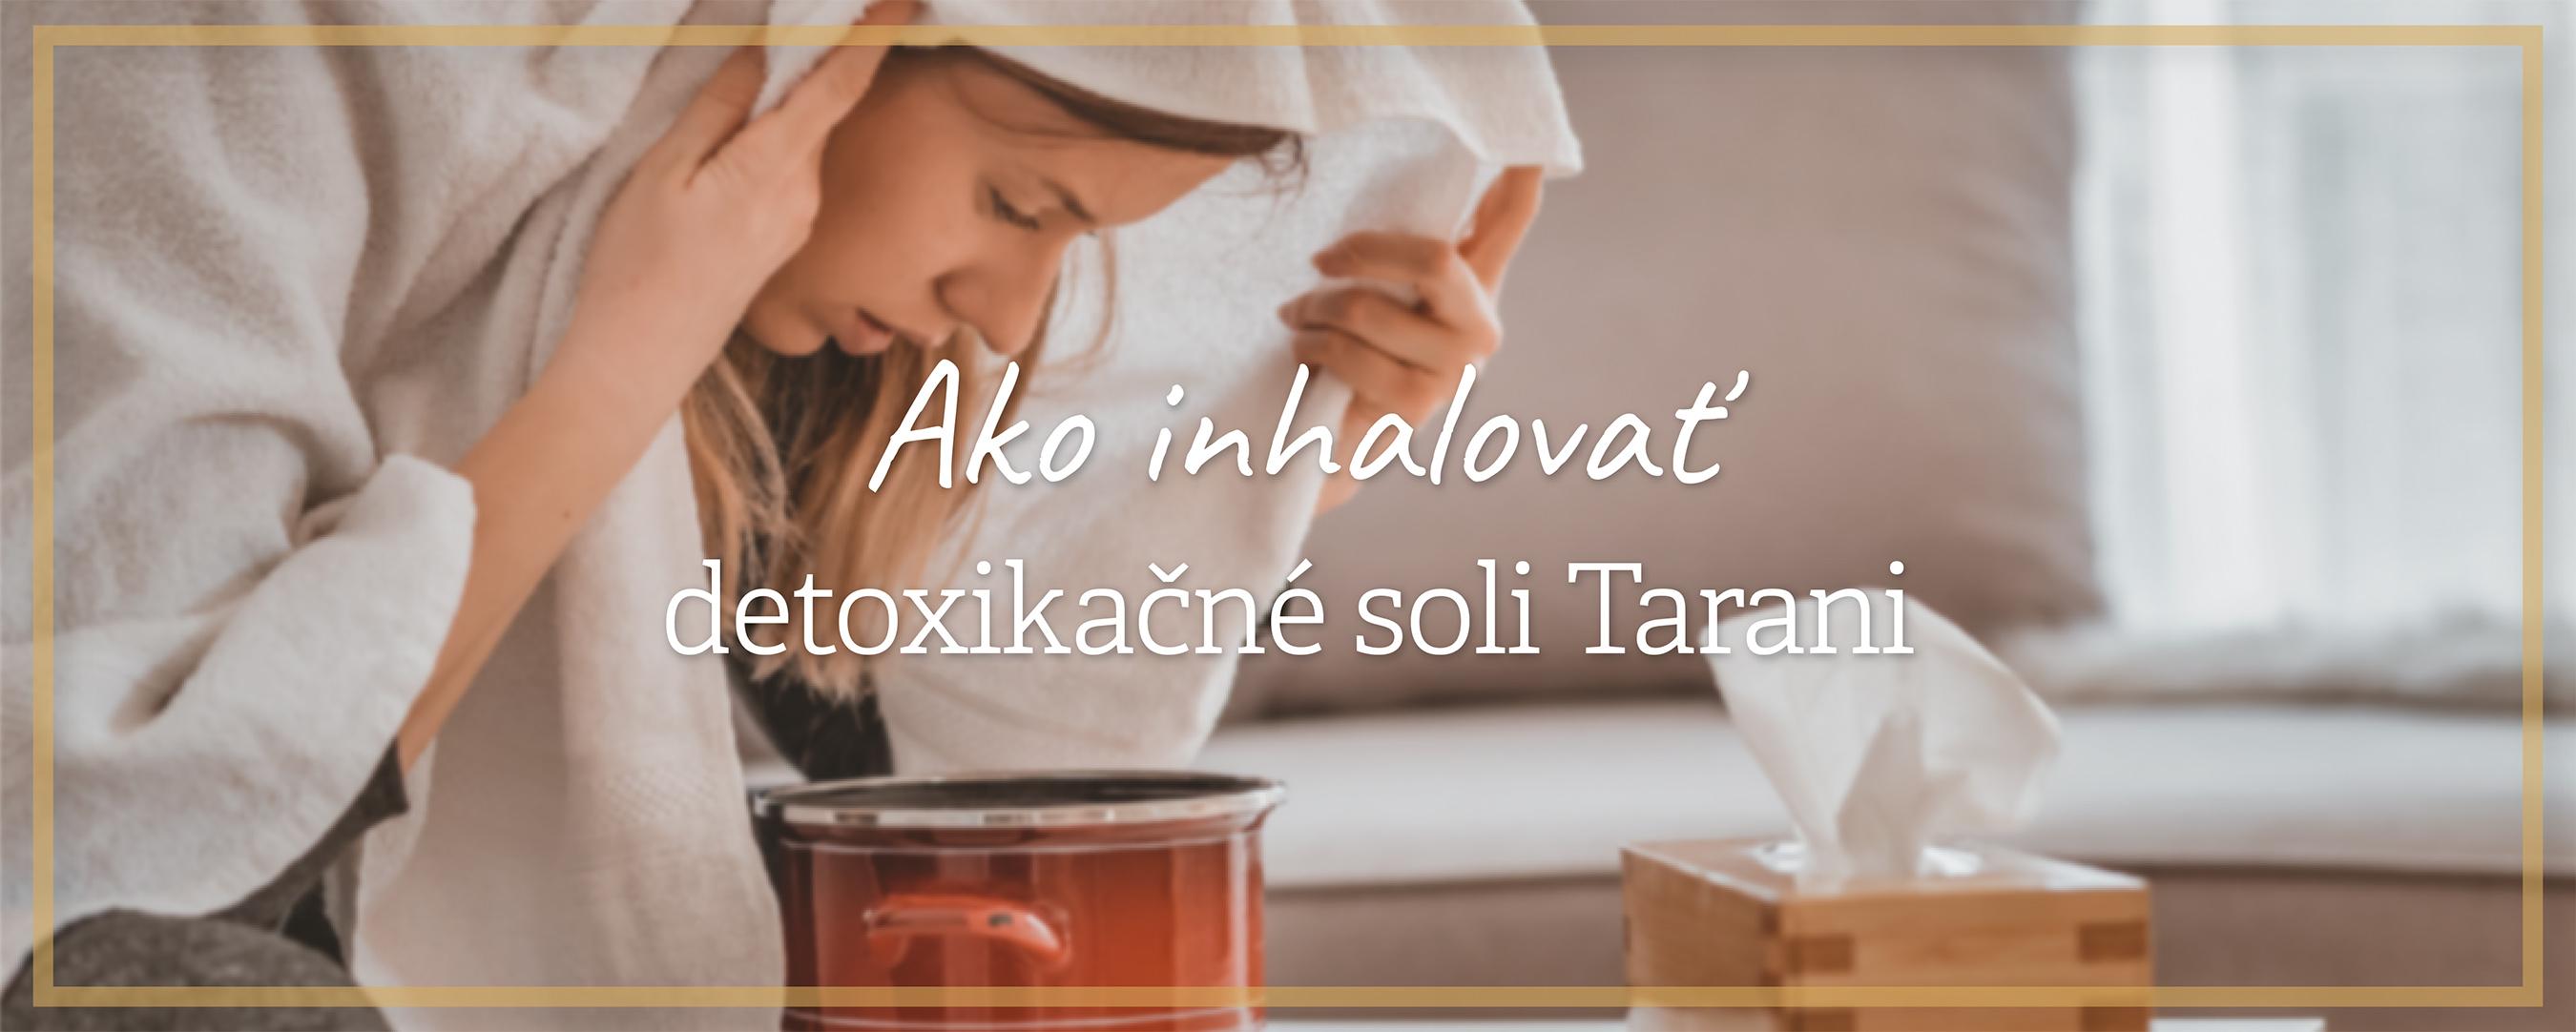 Inhalace soľ kúpeľ prírodný esence oleje